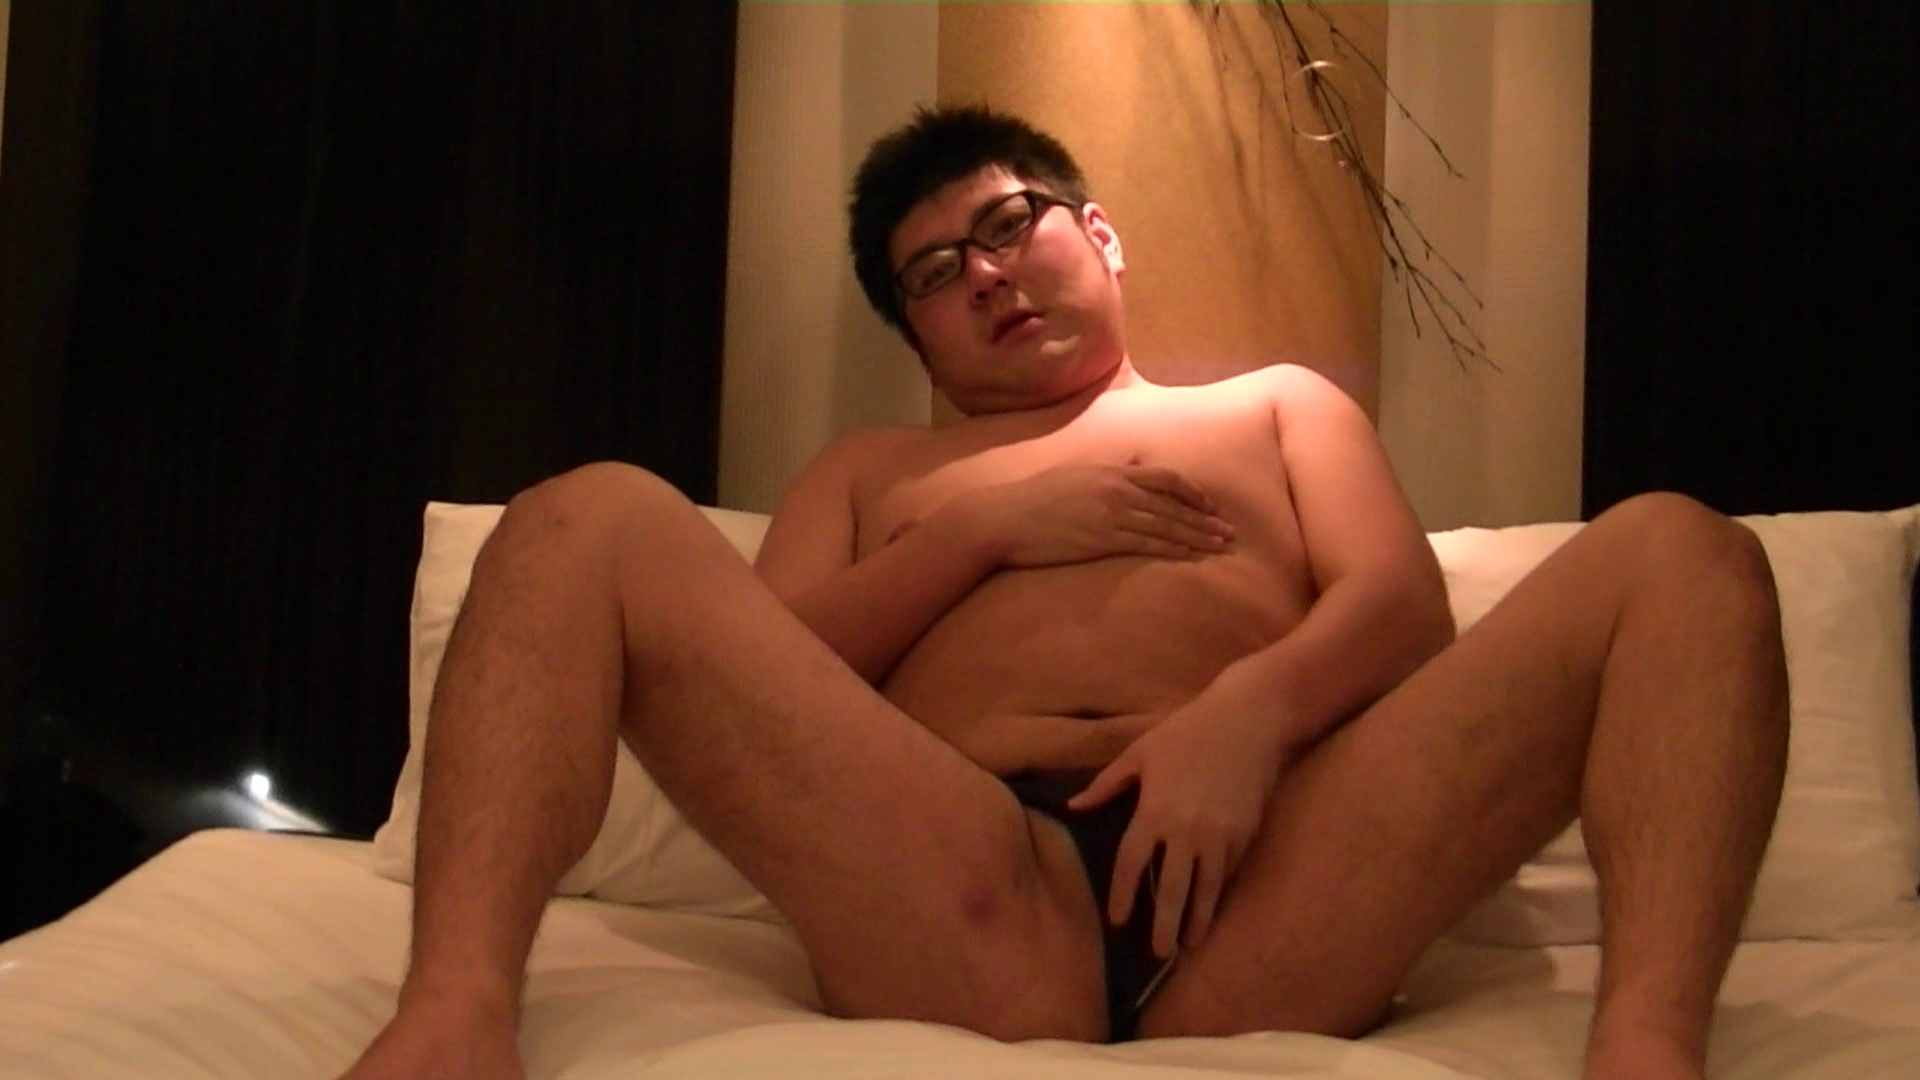 Mr.オナックスさん投稿!HD 貴方のオナニー三万円で撮影させてください。VOL.02 前編 ノンケのオナニー ペニス画像 105連発 17